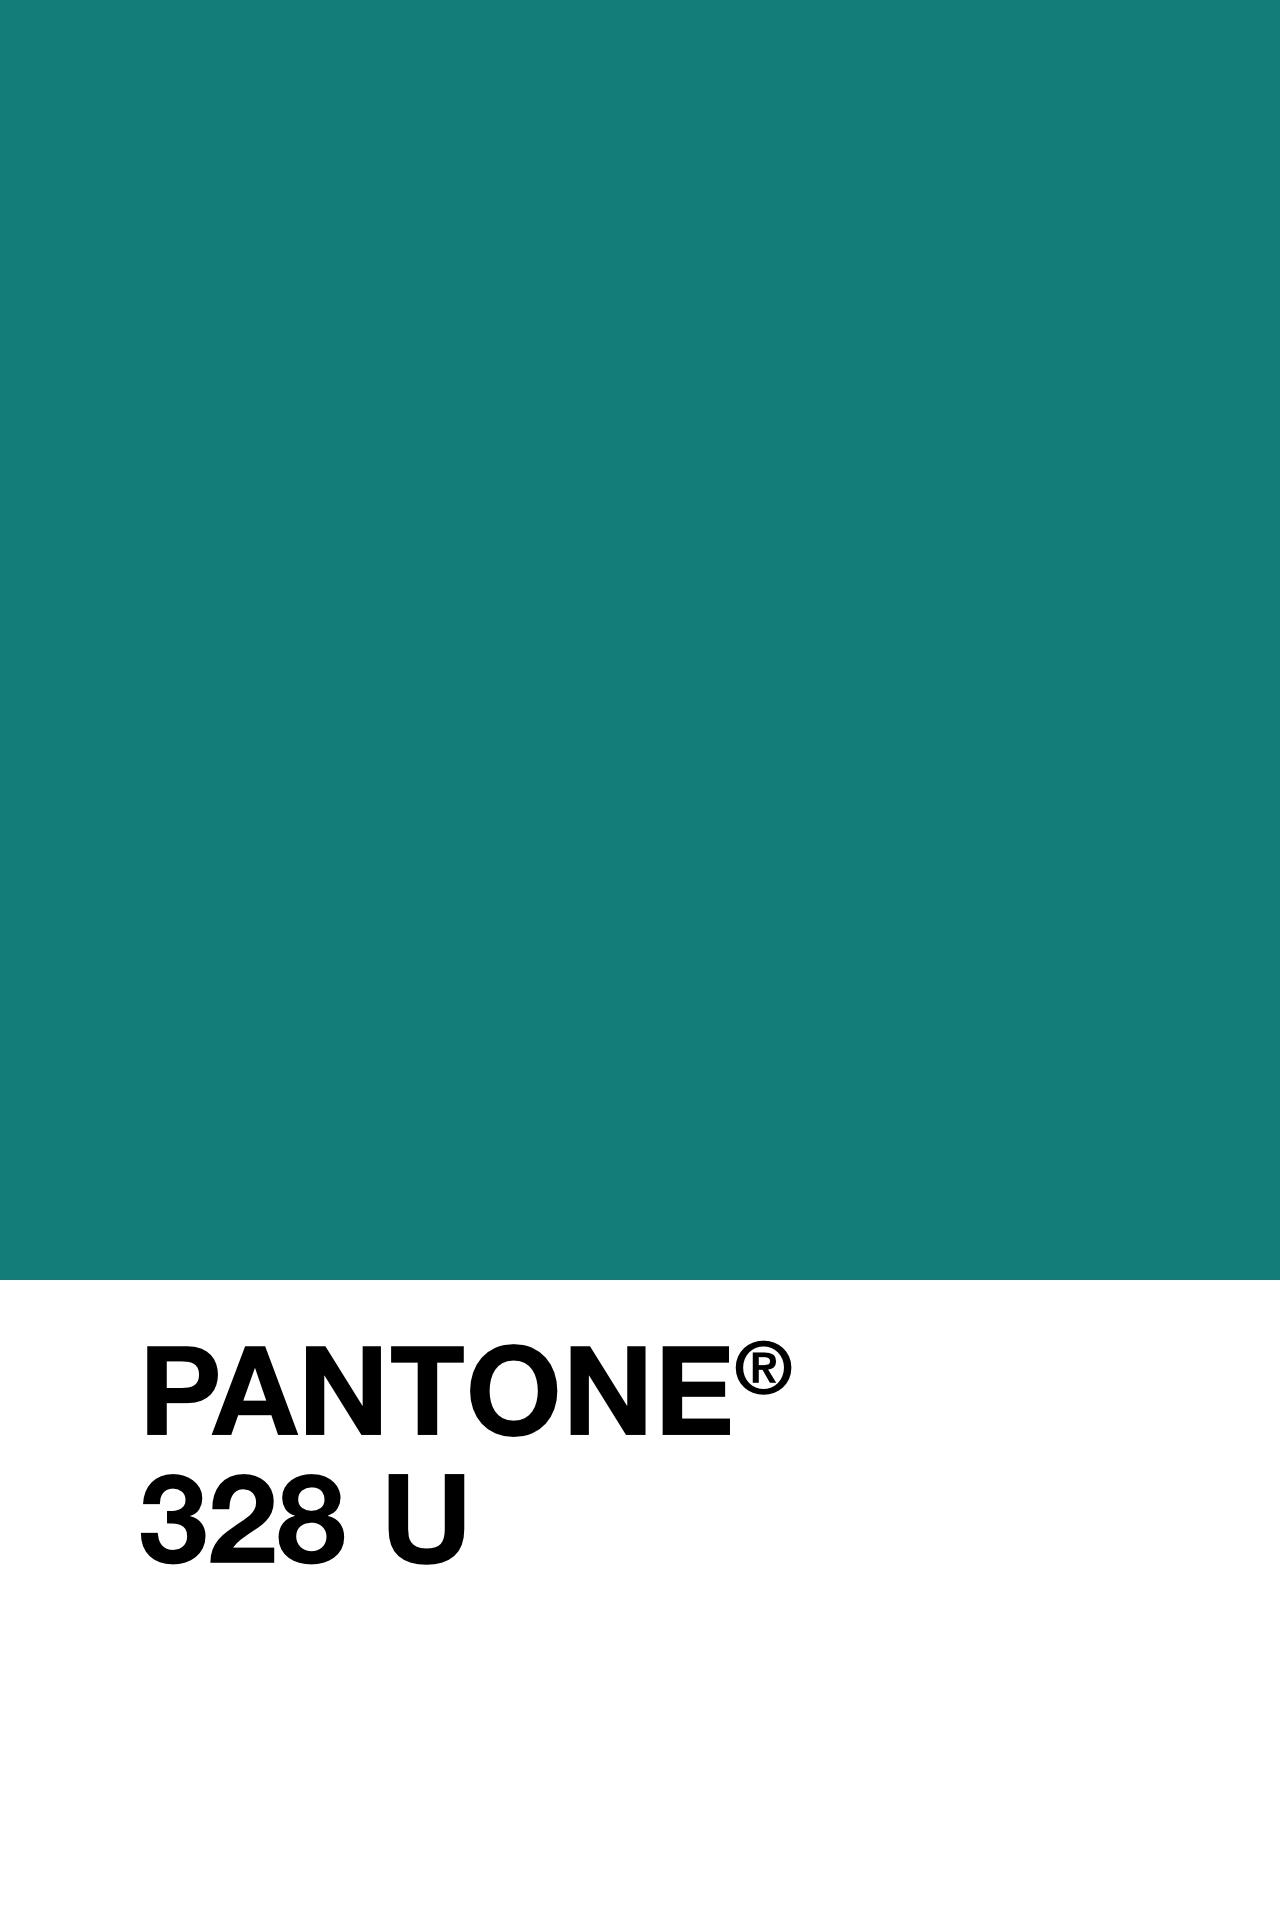 Energy Pantone 328 U Jeweltones Pantone Color